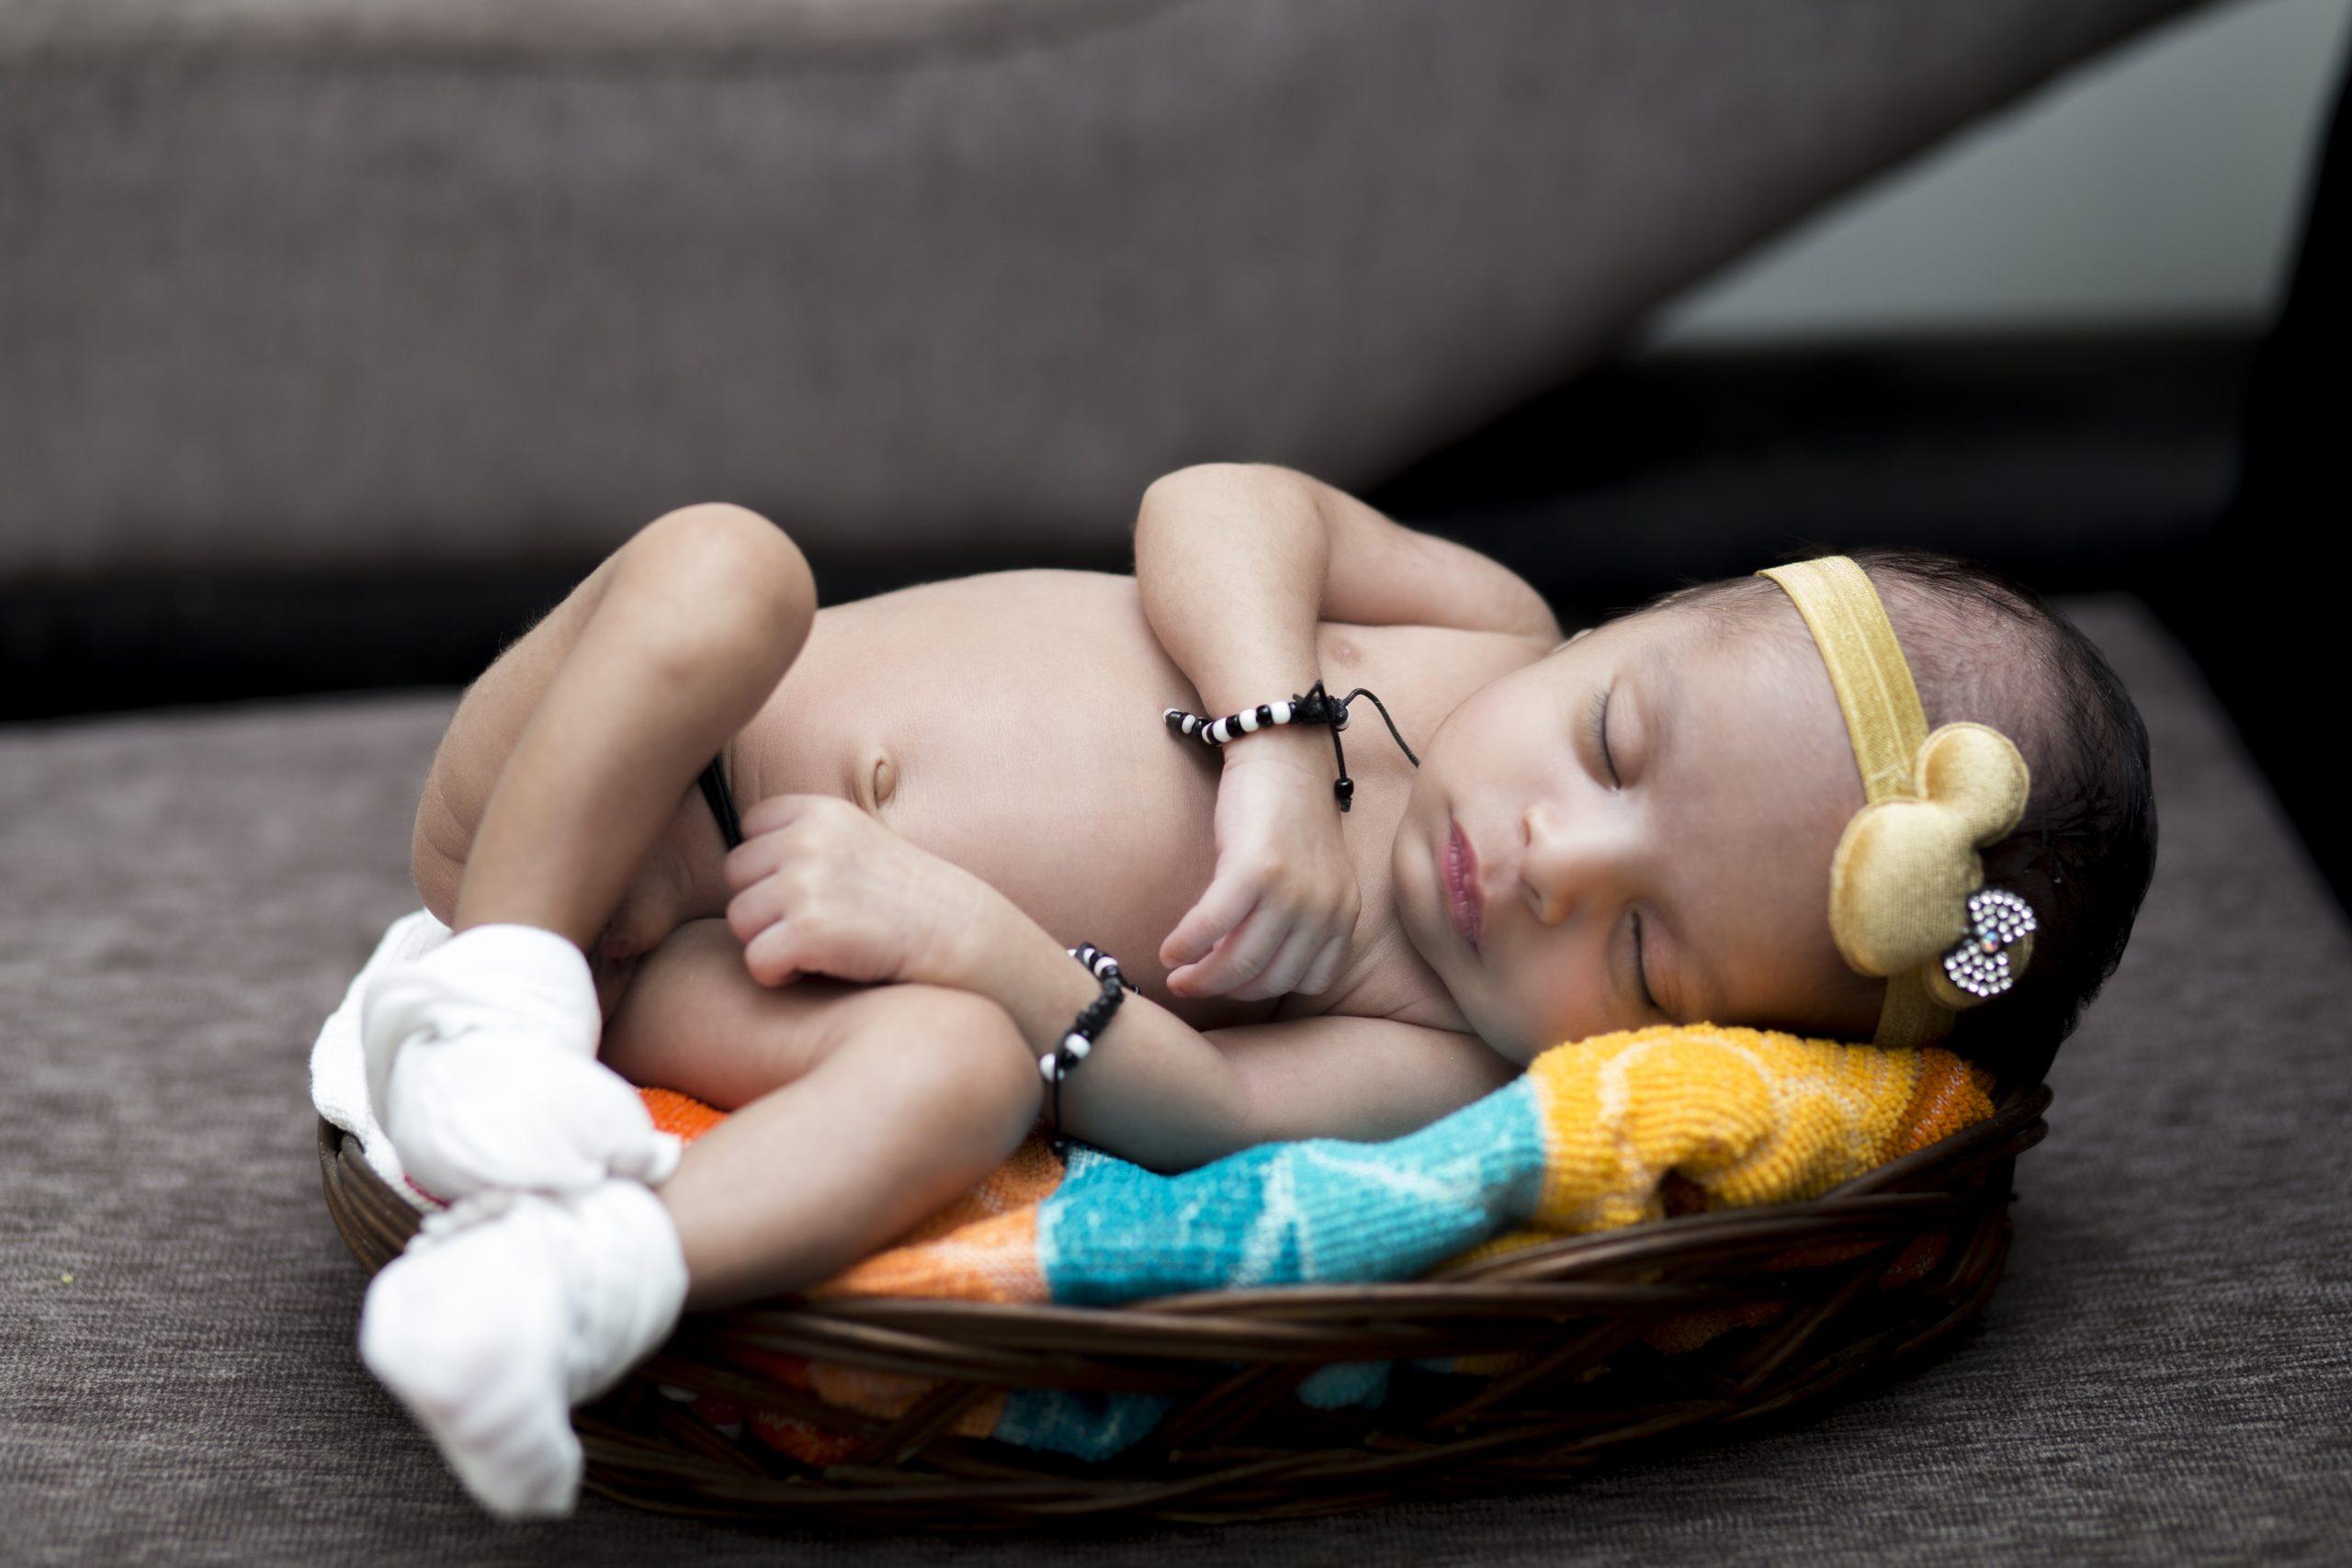 baby sleeping in a basket